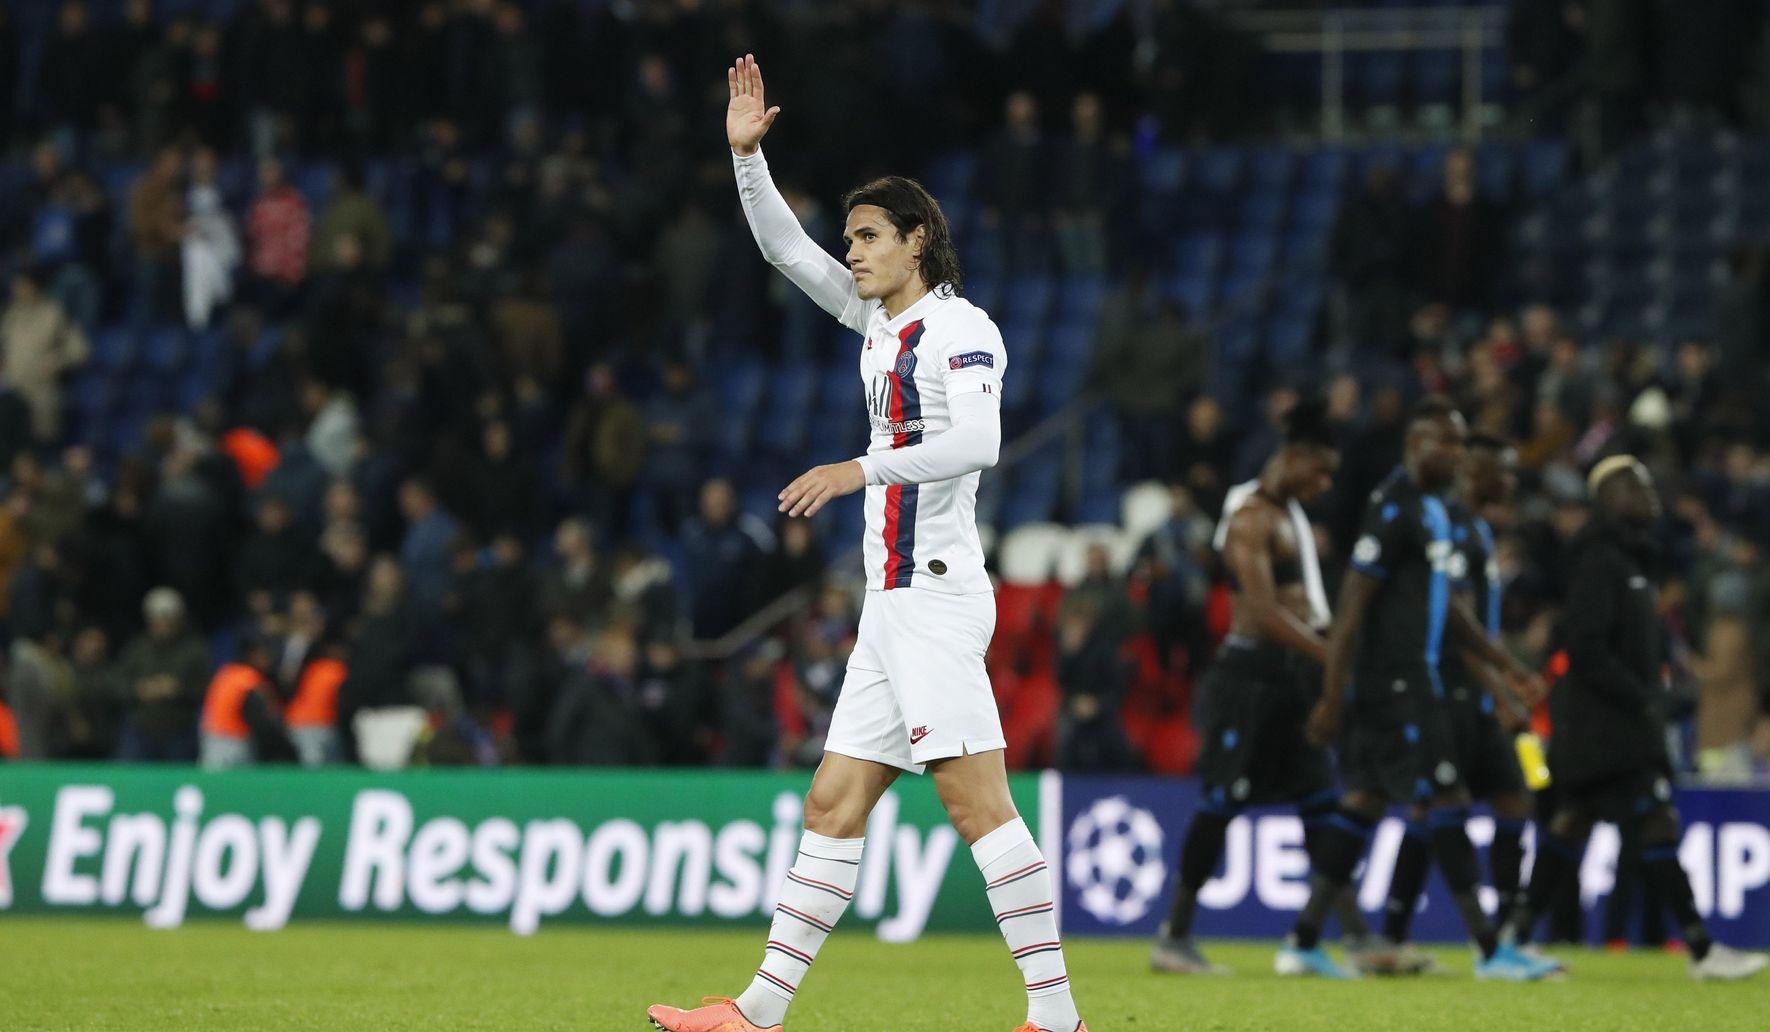 France_soccer_champions_league_18361_c0-179-4627-2876_s1770x1032